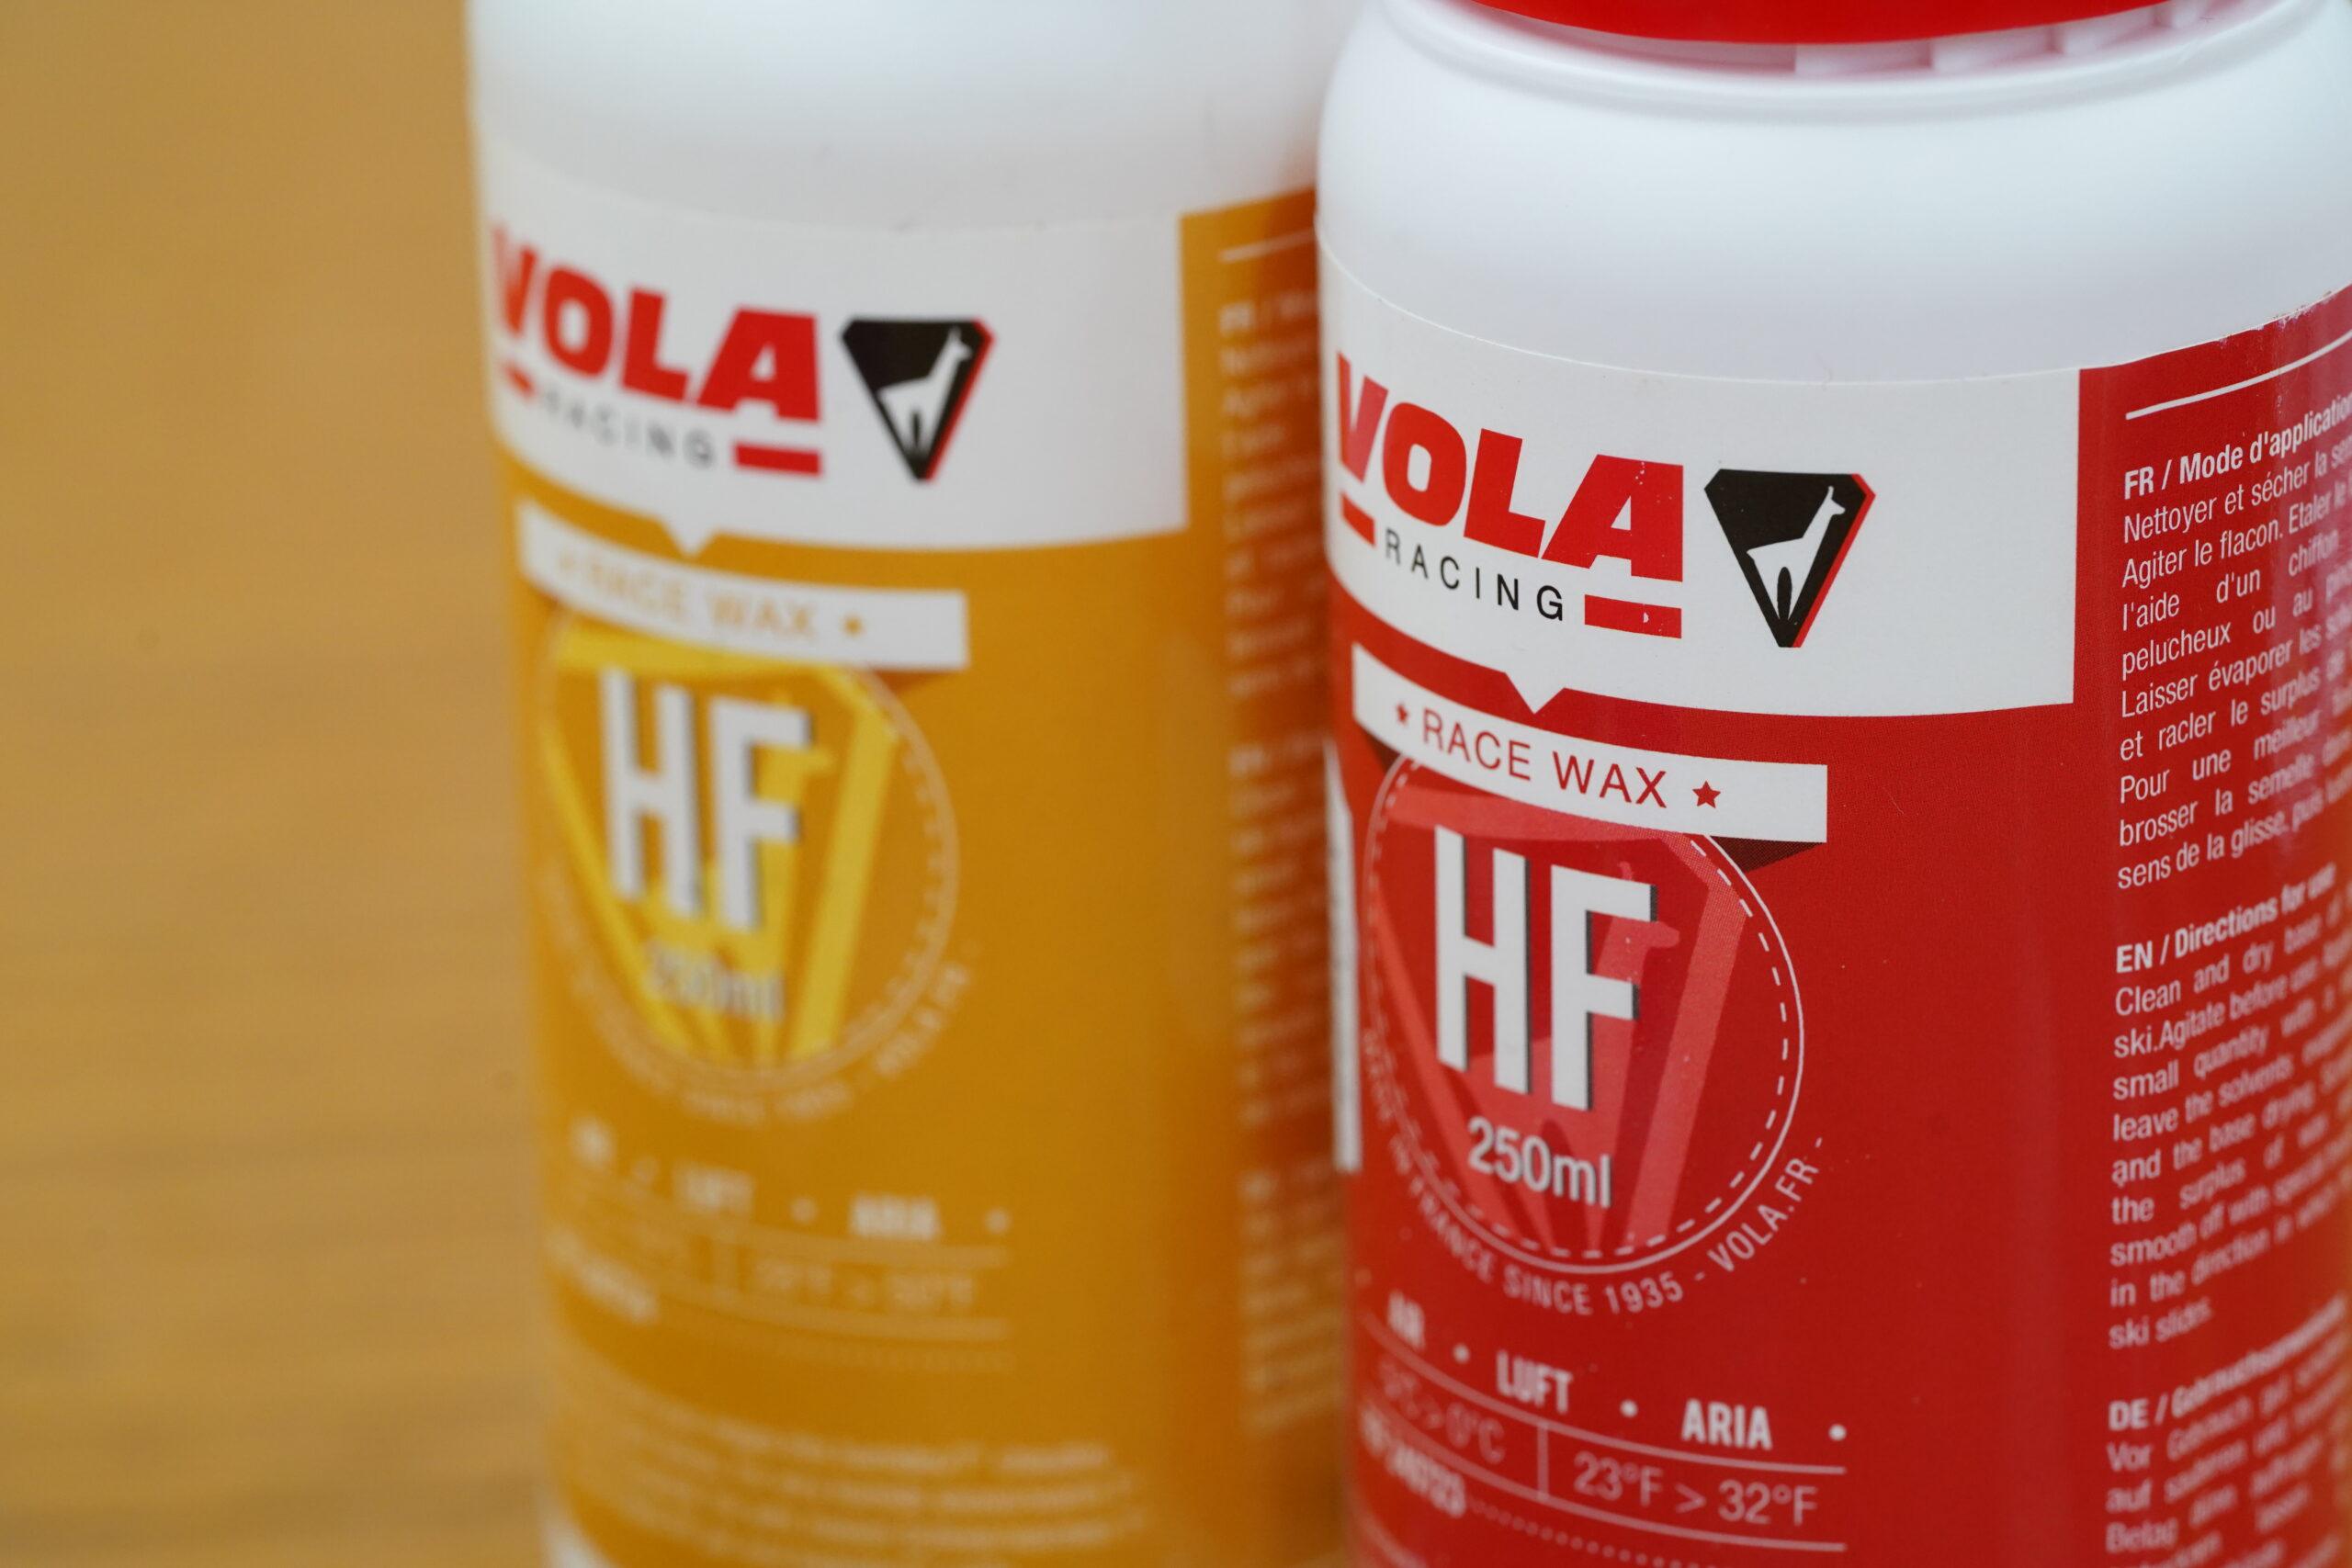 HF HIGH FLUOR ハイフッ素ワックス VOLA